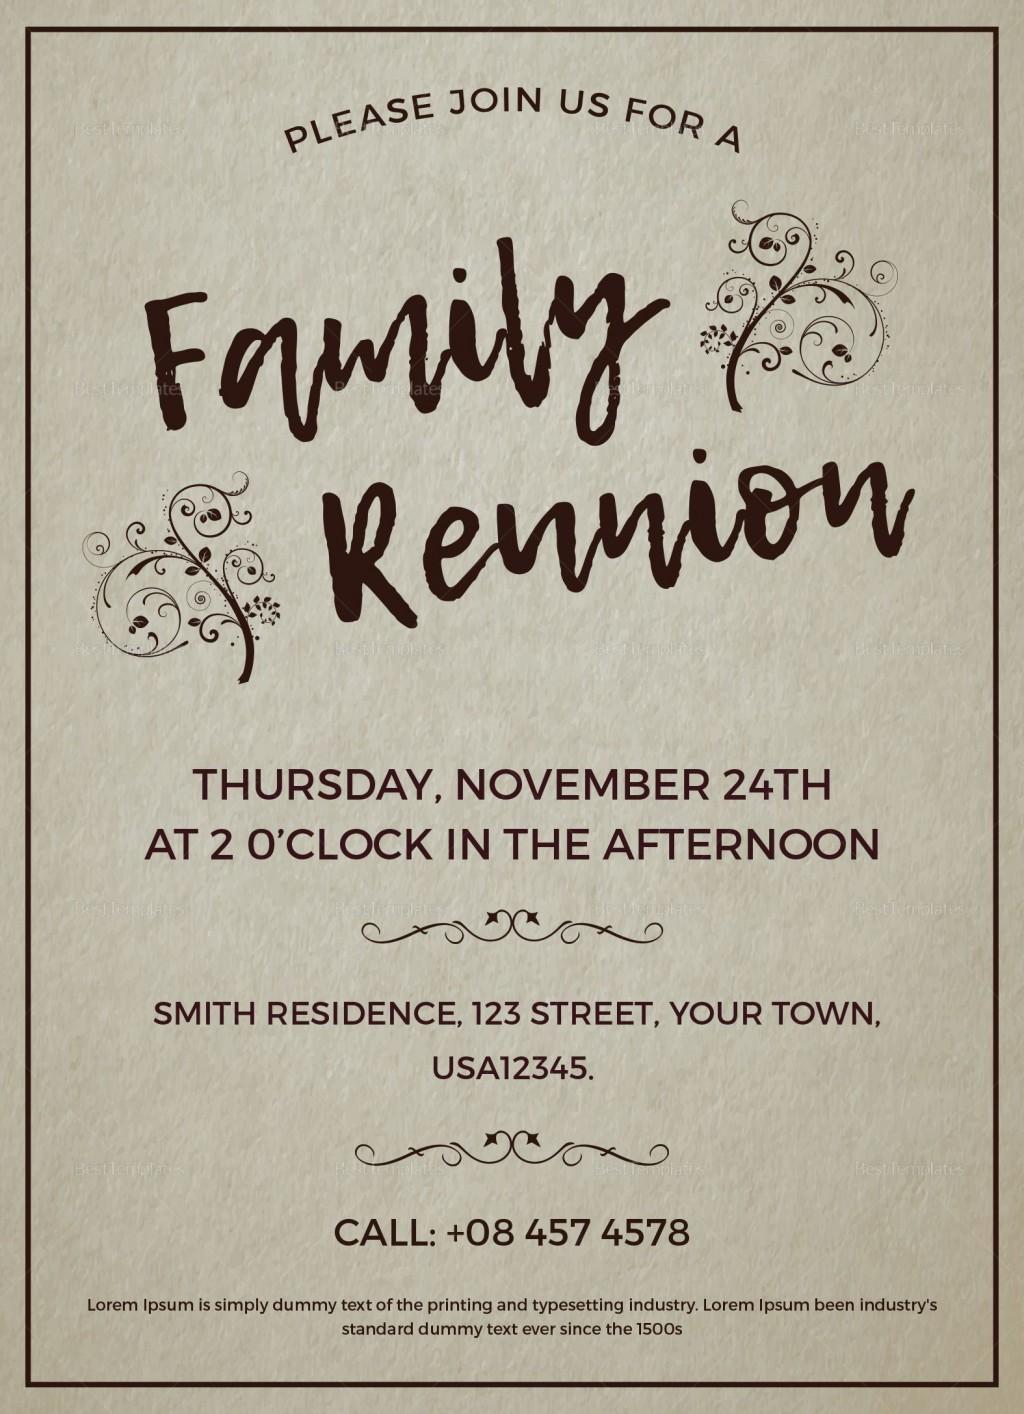 003 Excellent Free Downloadable Family Reunion Flyer Template Concept Large